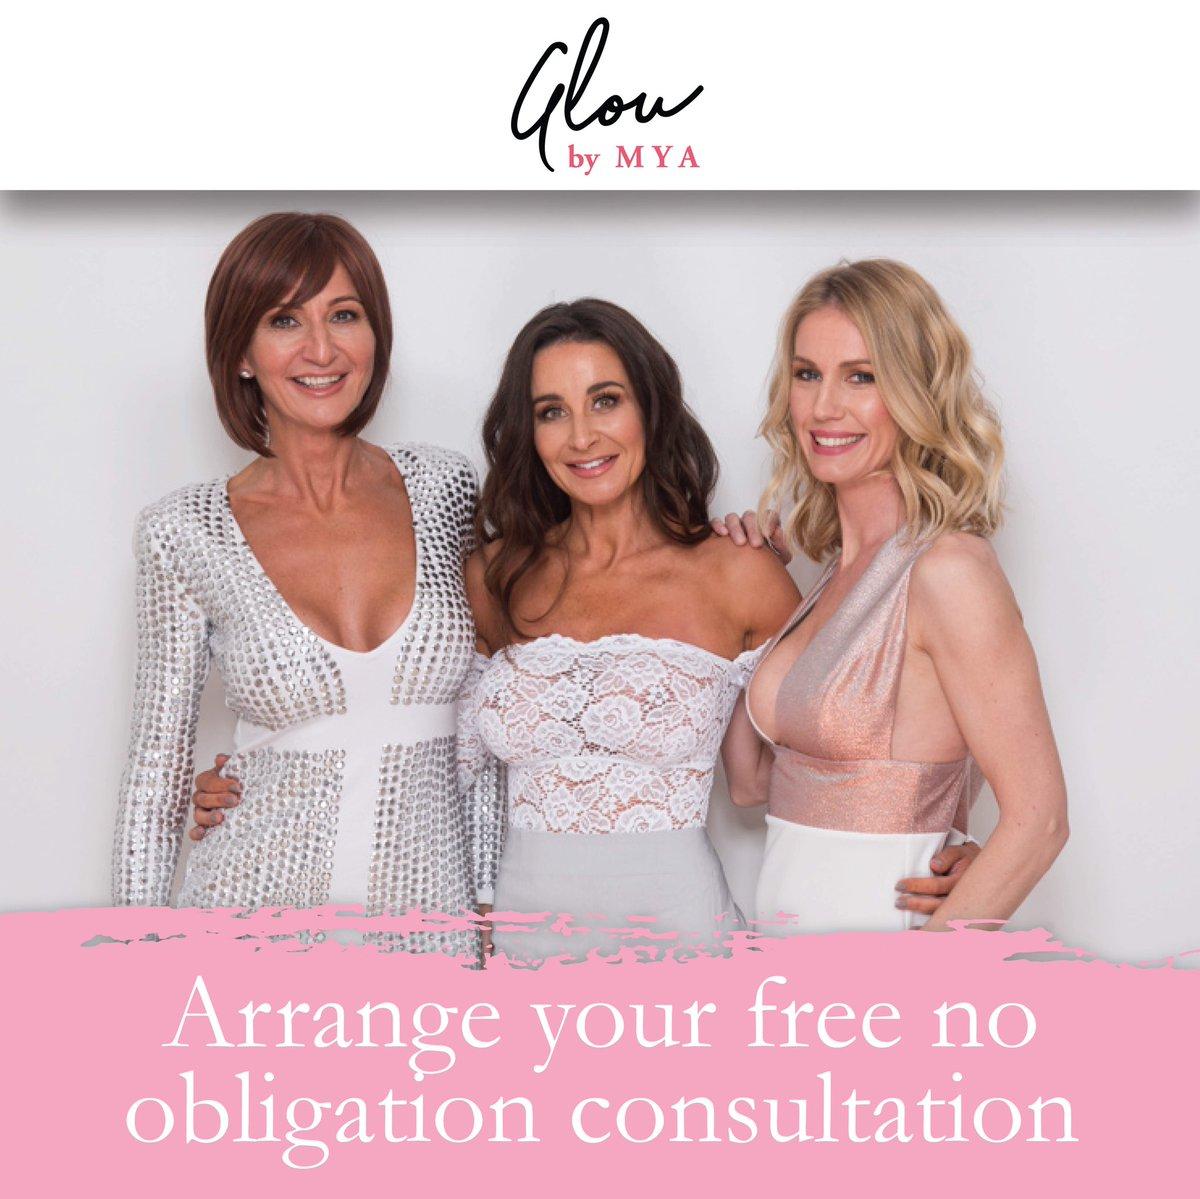 Visit http://glowbymya.co.uk to arrange your free consultation today! #GlowByMYA #MYA #CosmeticSurgery pic.twitter.com/IsvqNZXGJR